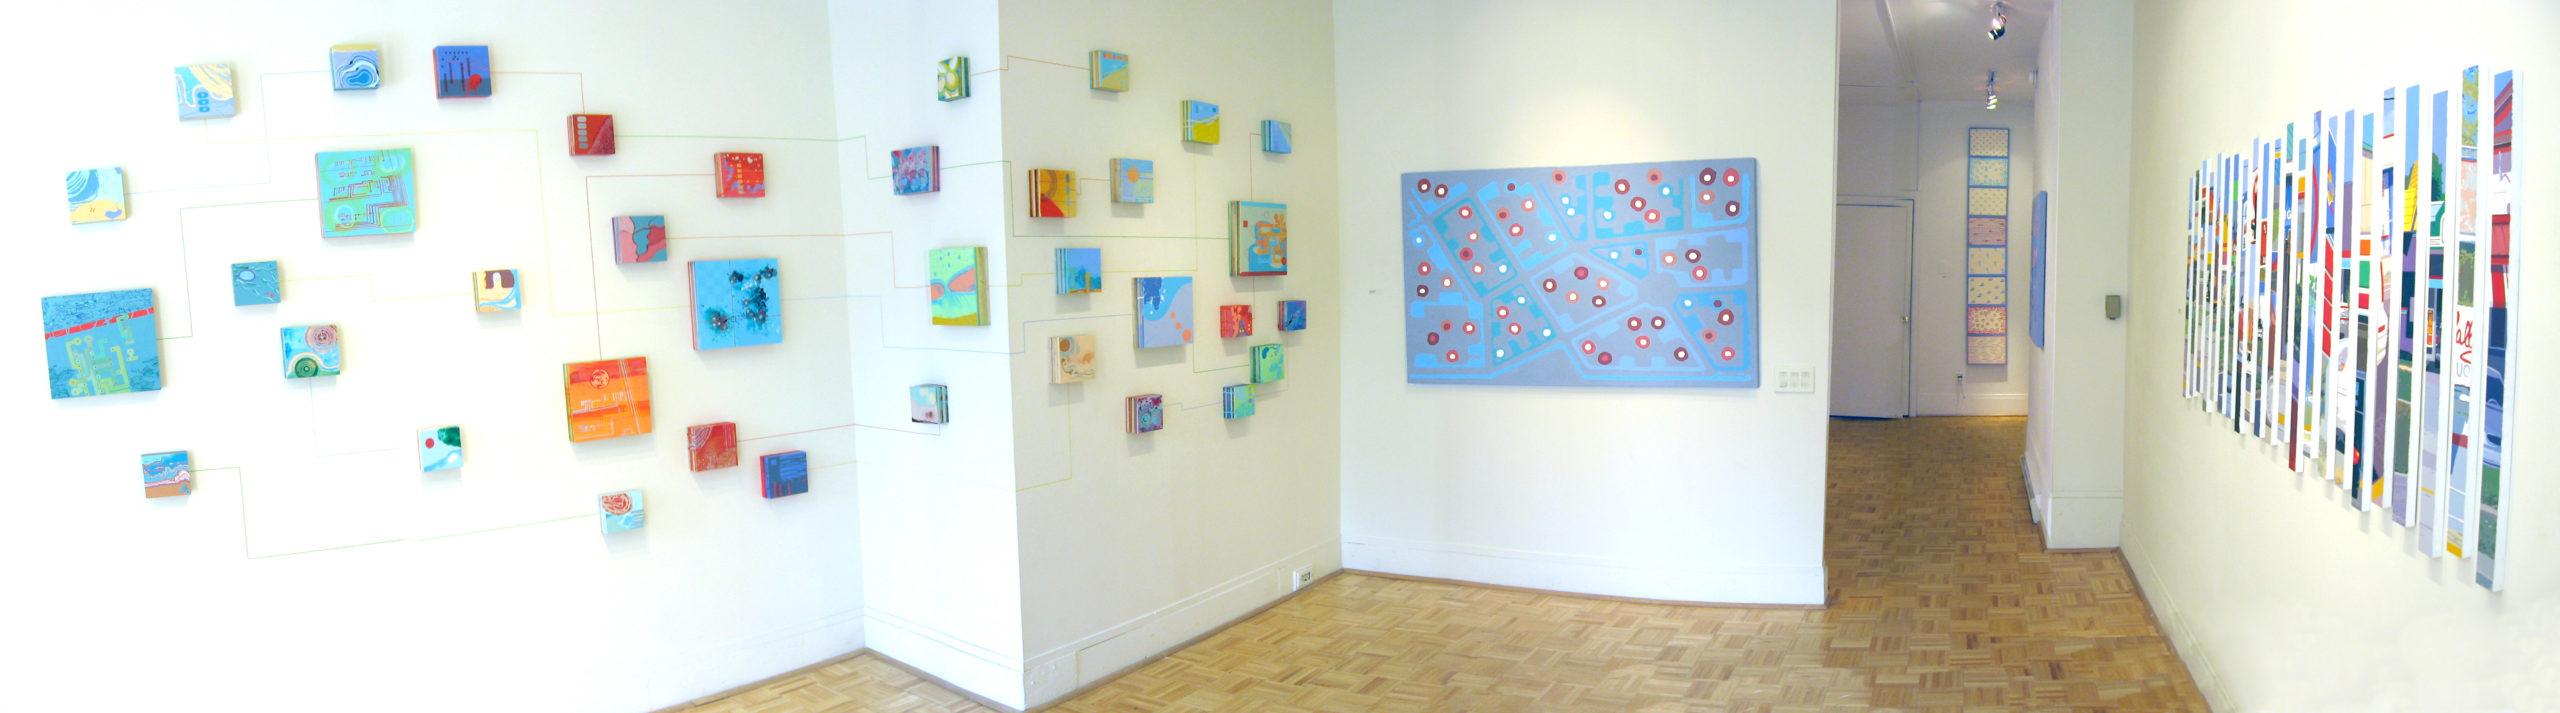 Transcapes- Solo Exhibition Bridgette Mayer Gallery